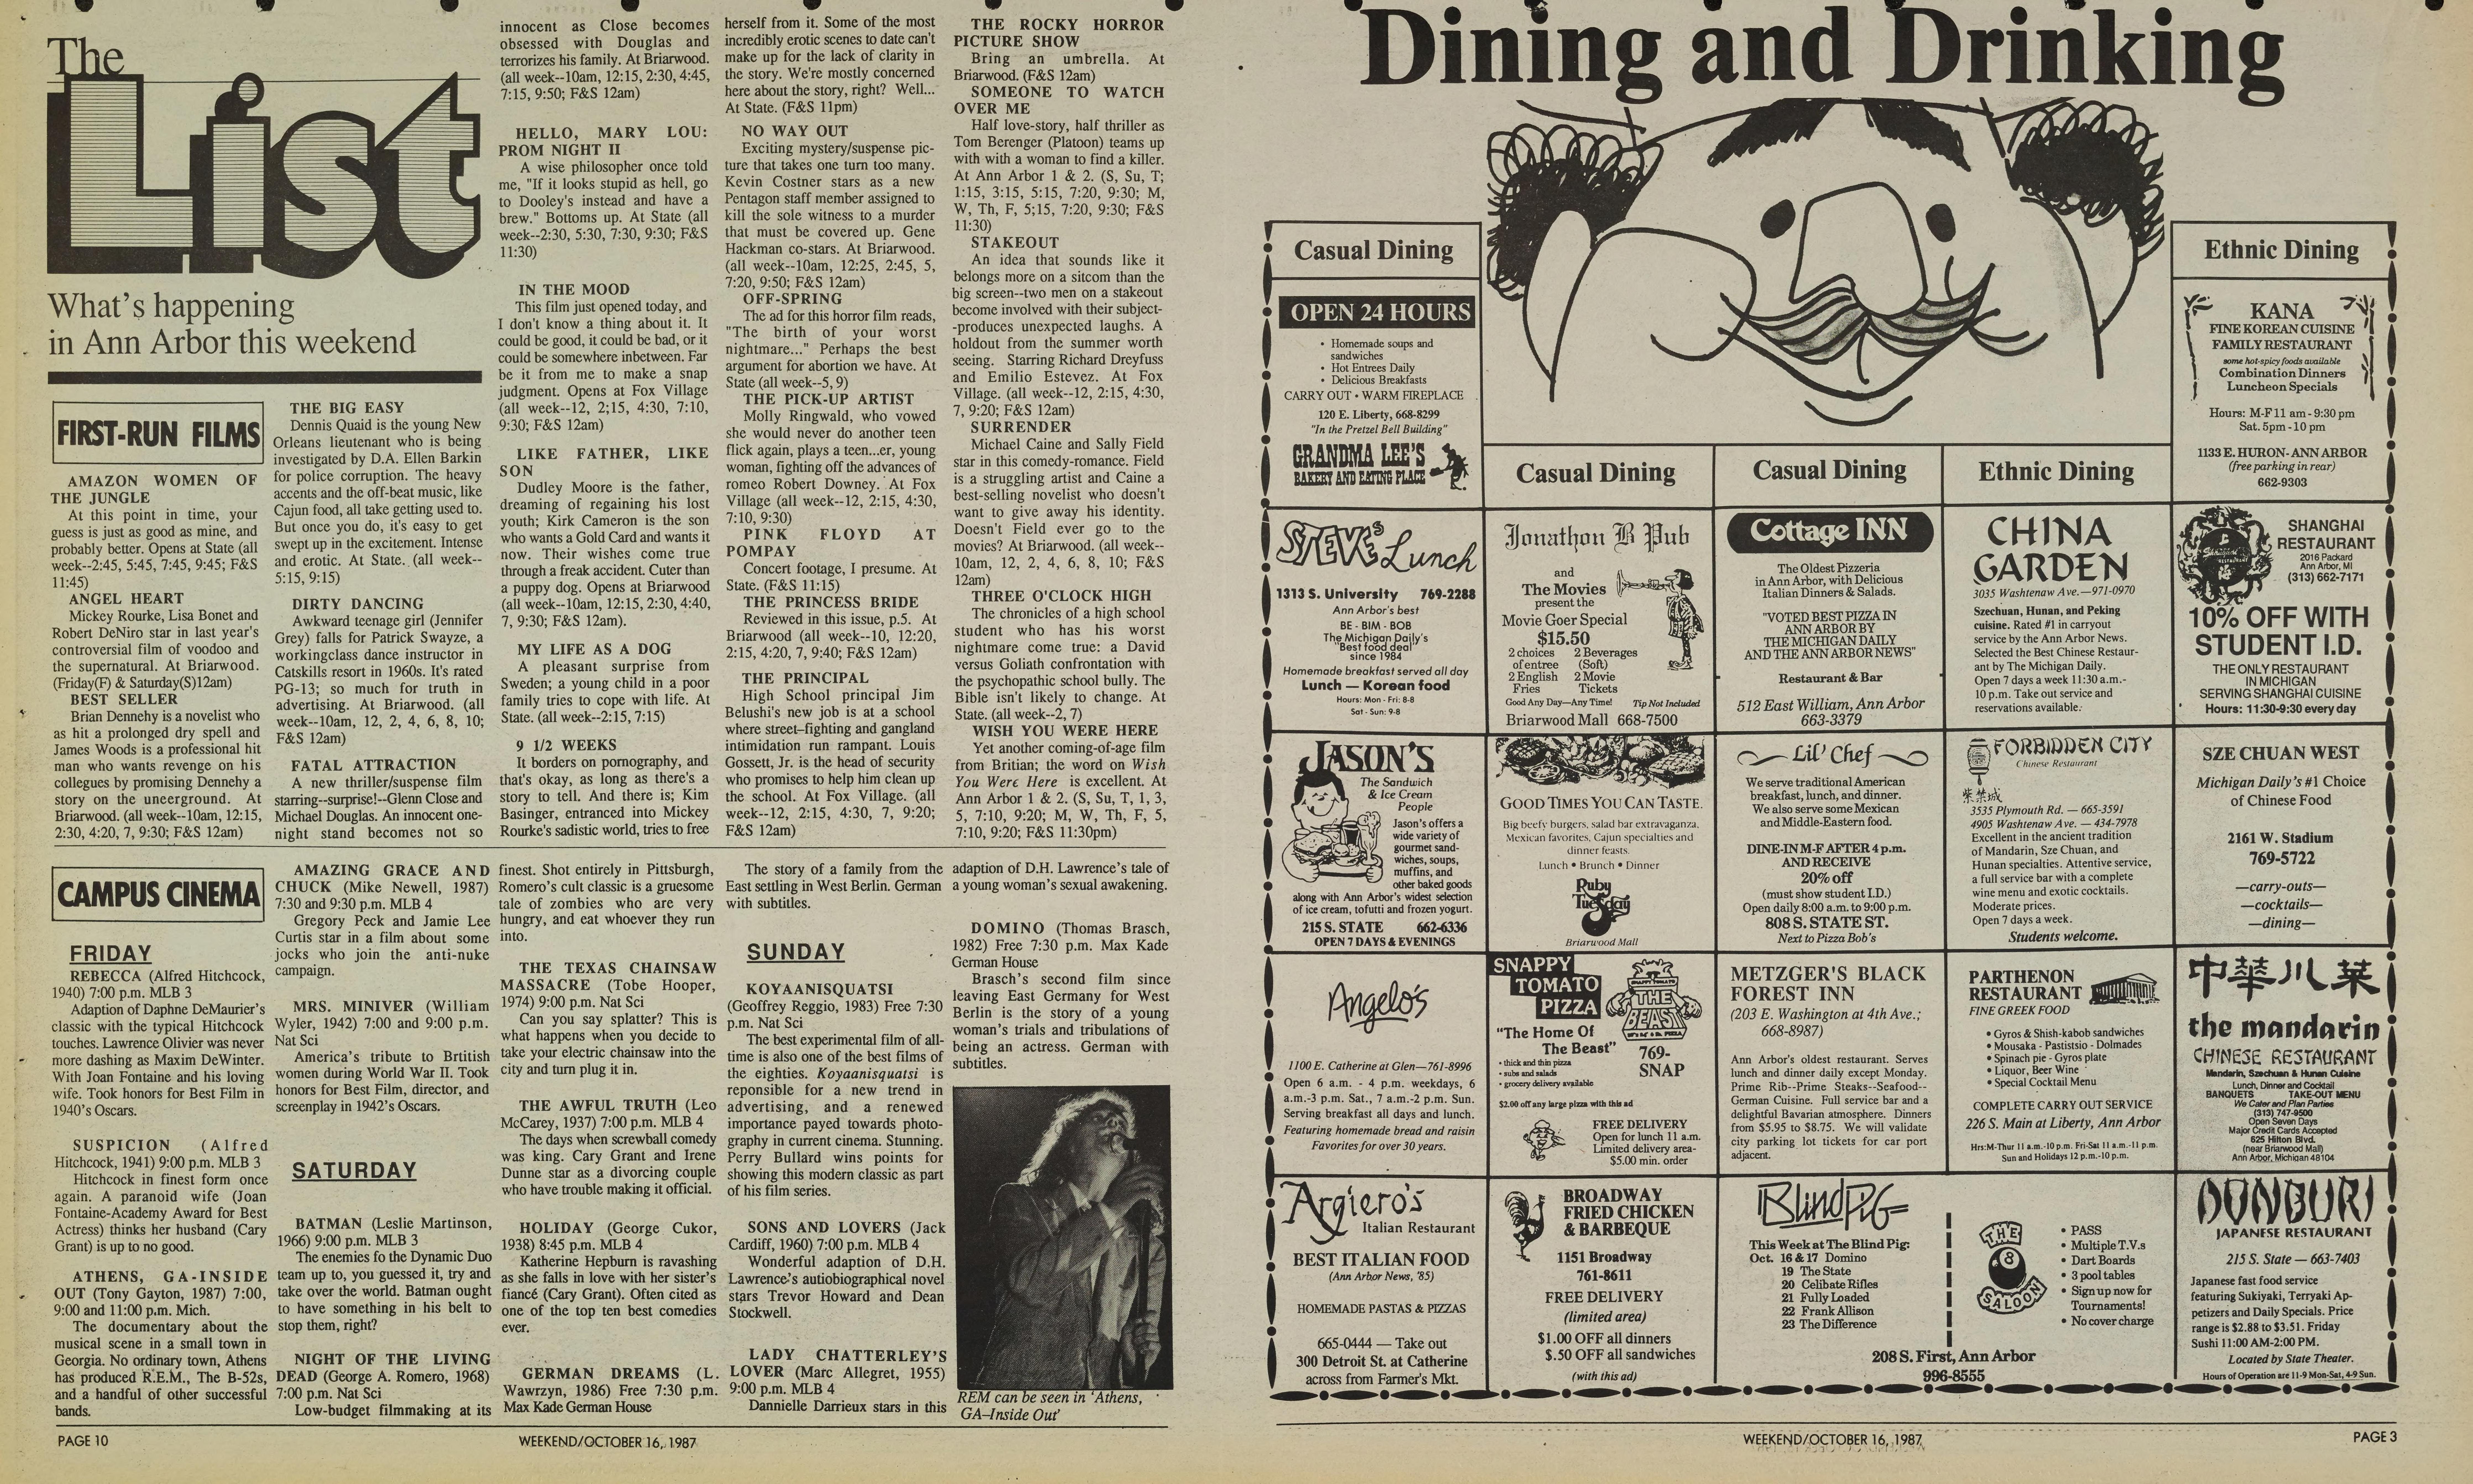 Michigan Daily Digital Archives - October 16, 1987 (vol  98